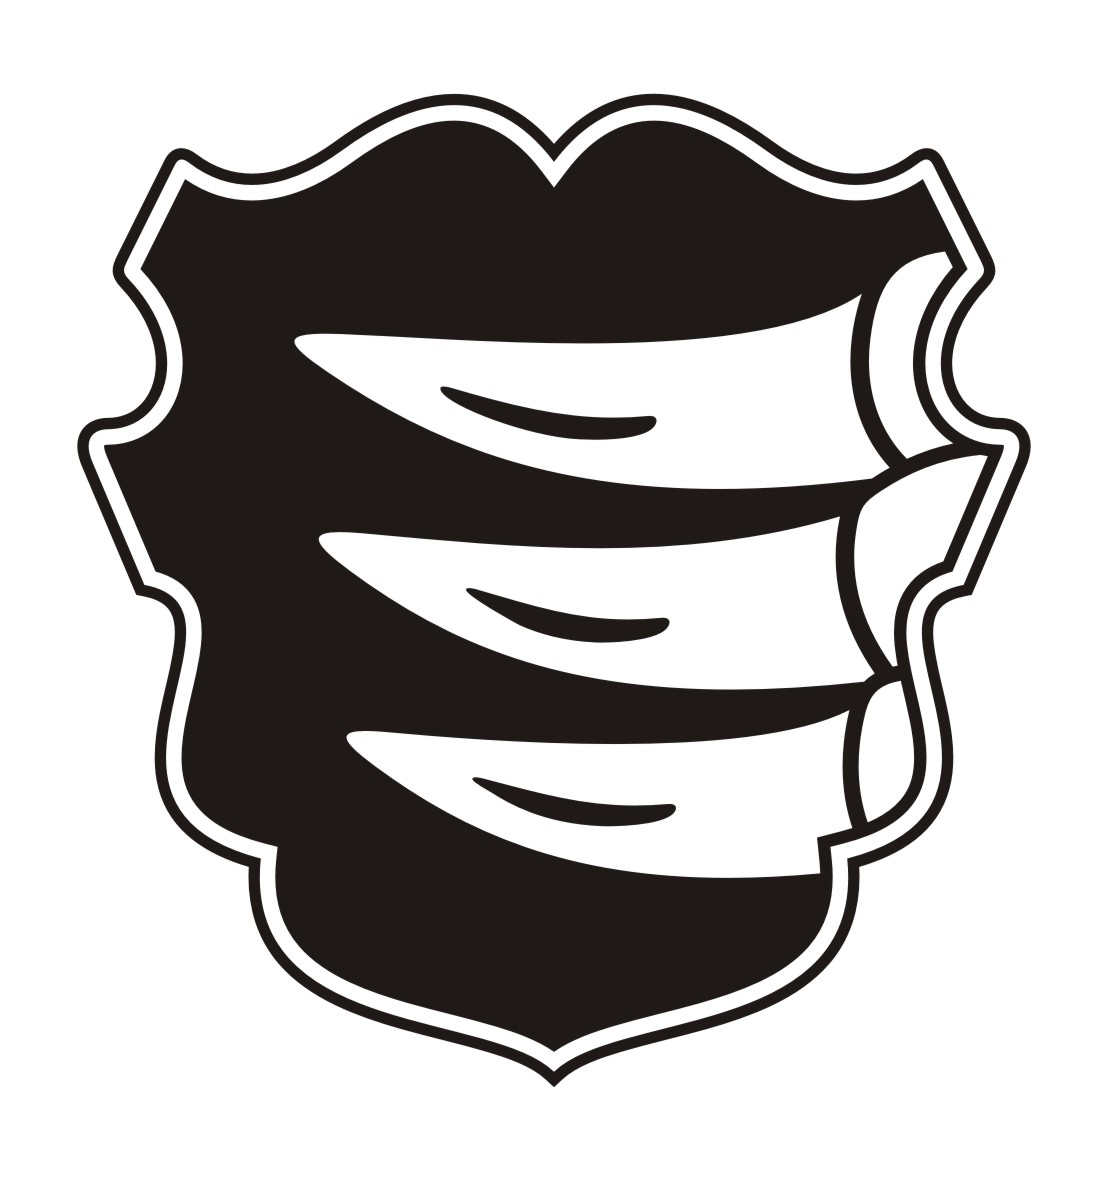 Fundatia Bathori Istvan logo